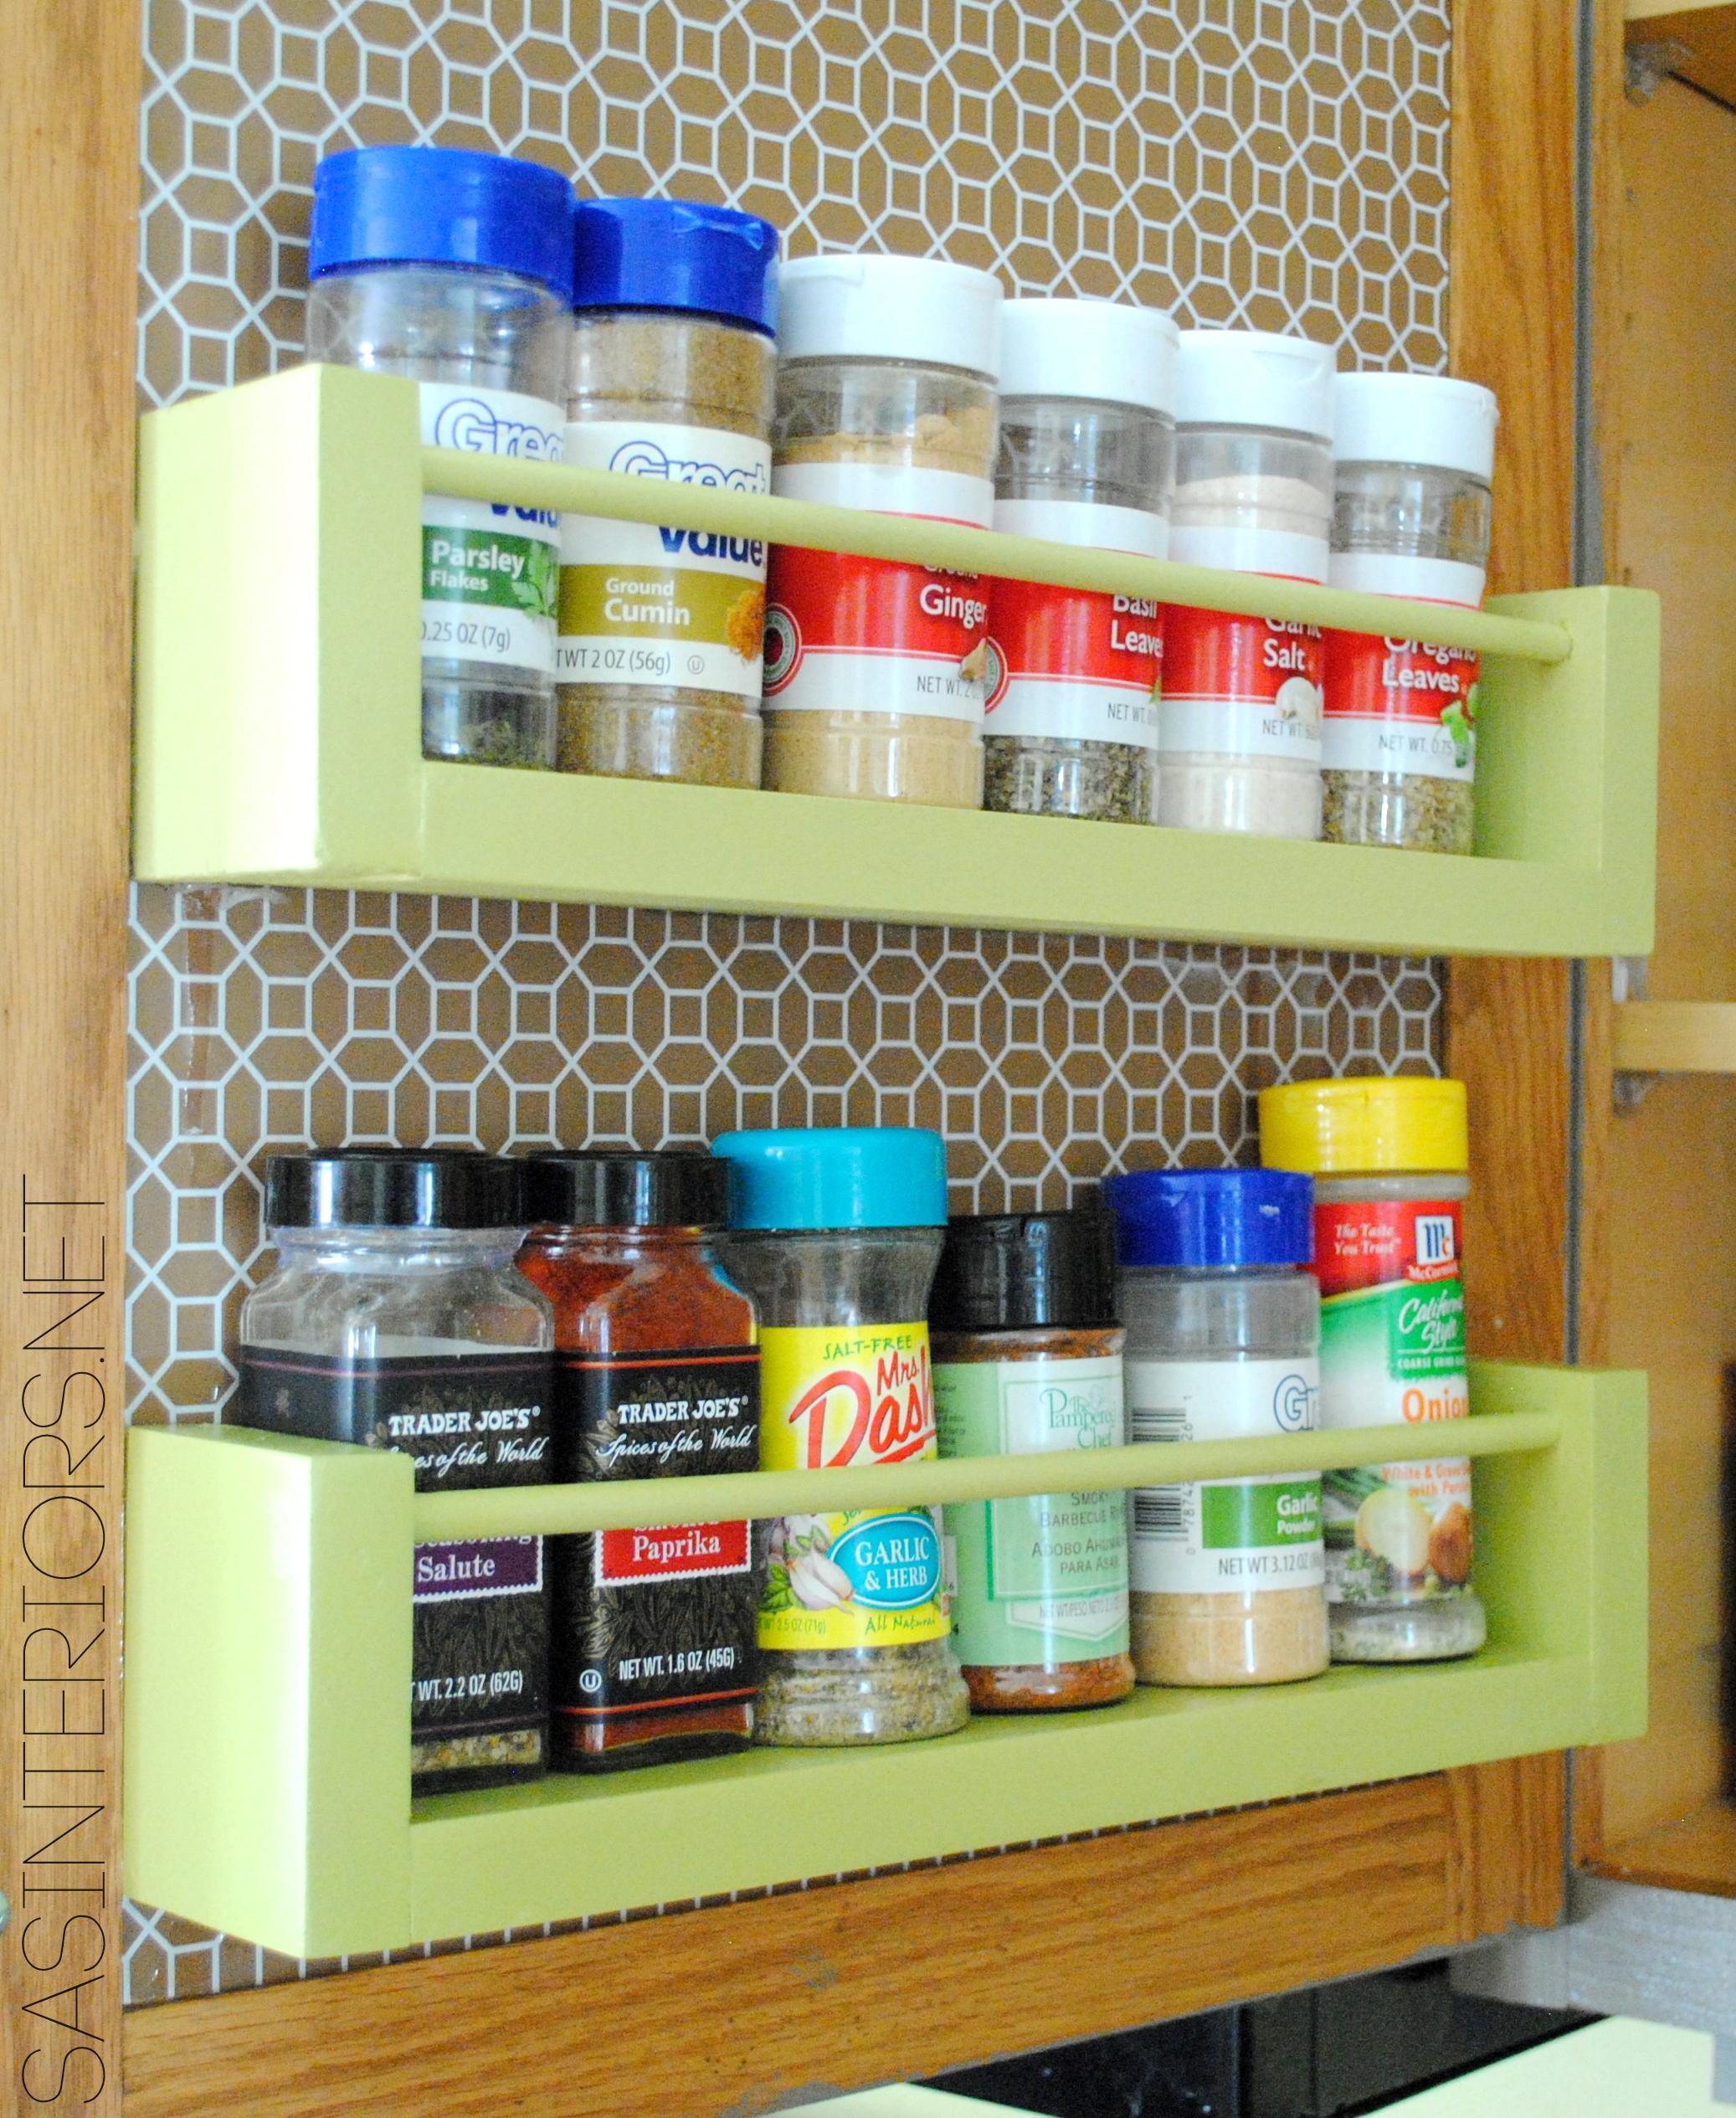 Diy Kitchen Spice Rack: DIY: Wood Spice Rack